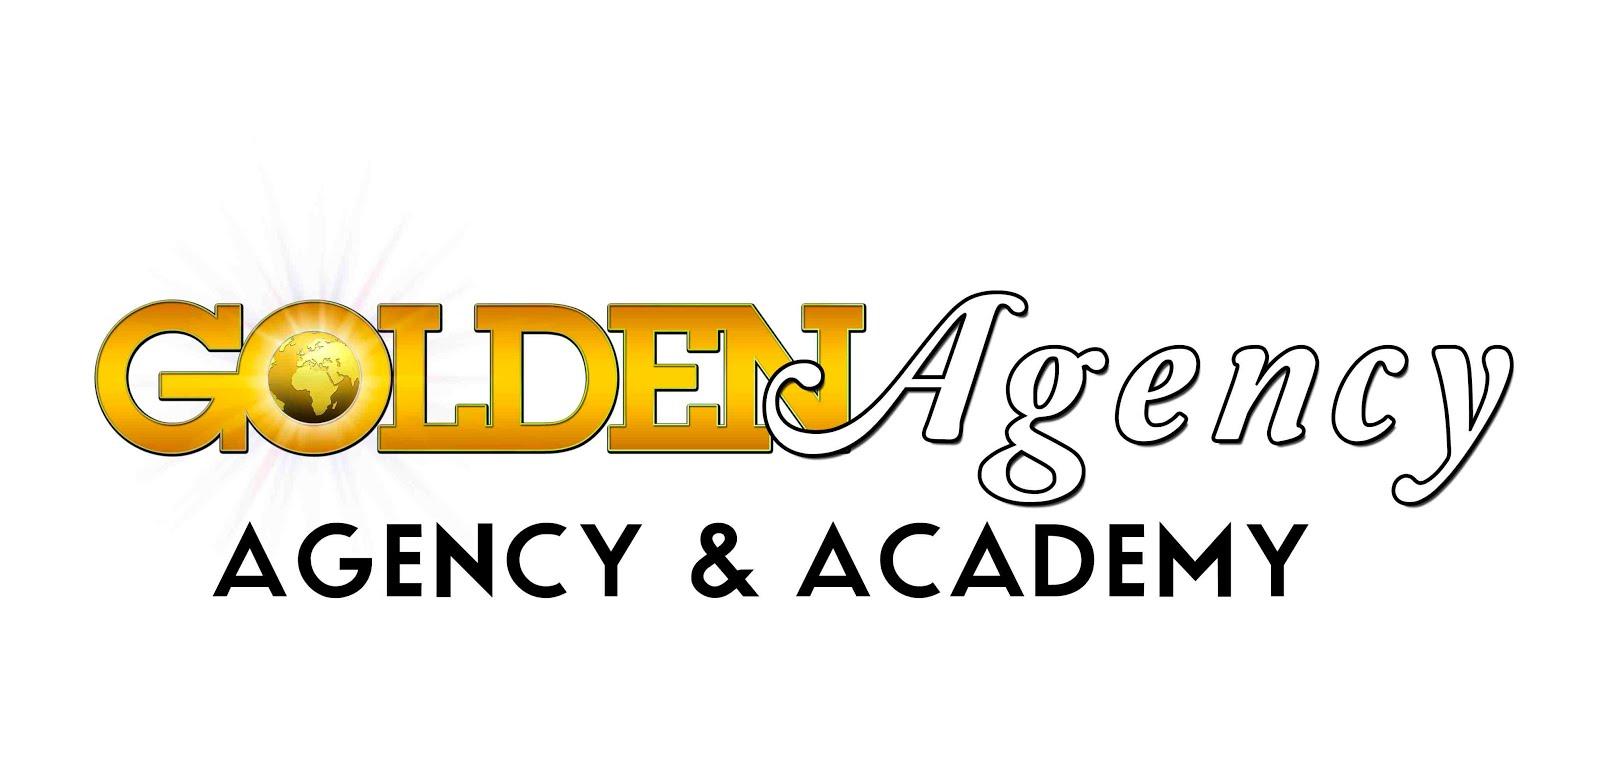 GOLDEN AGENCY